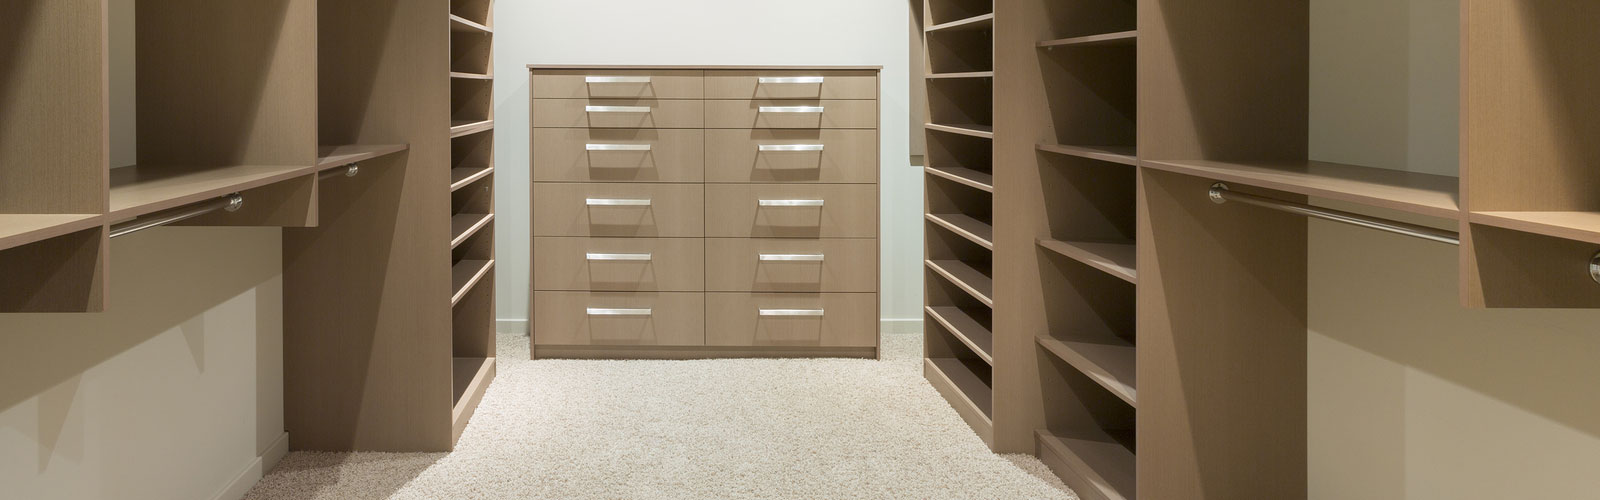 the designing right design closet interior hgtv remodel layout